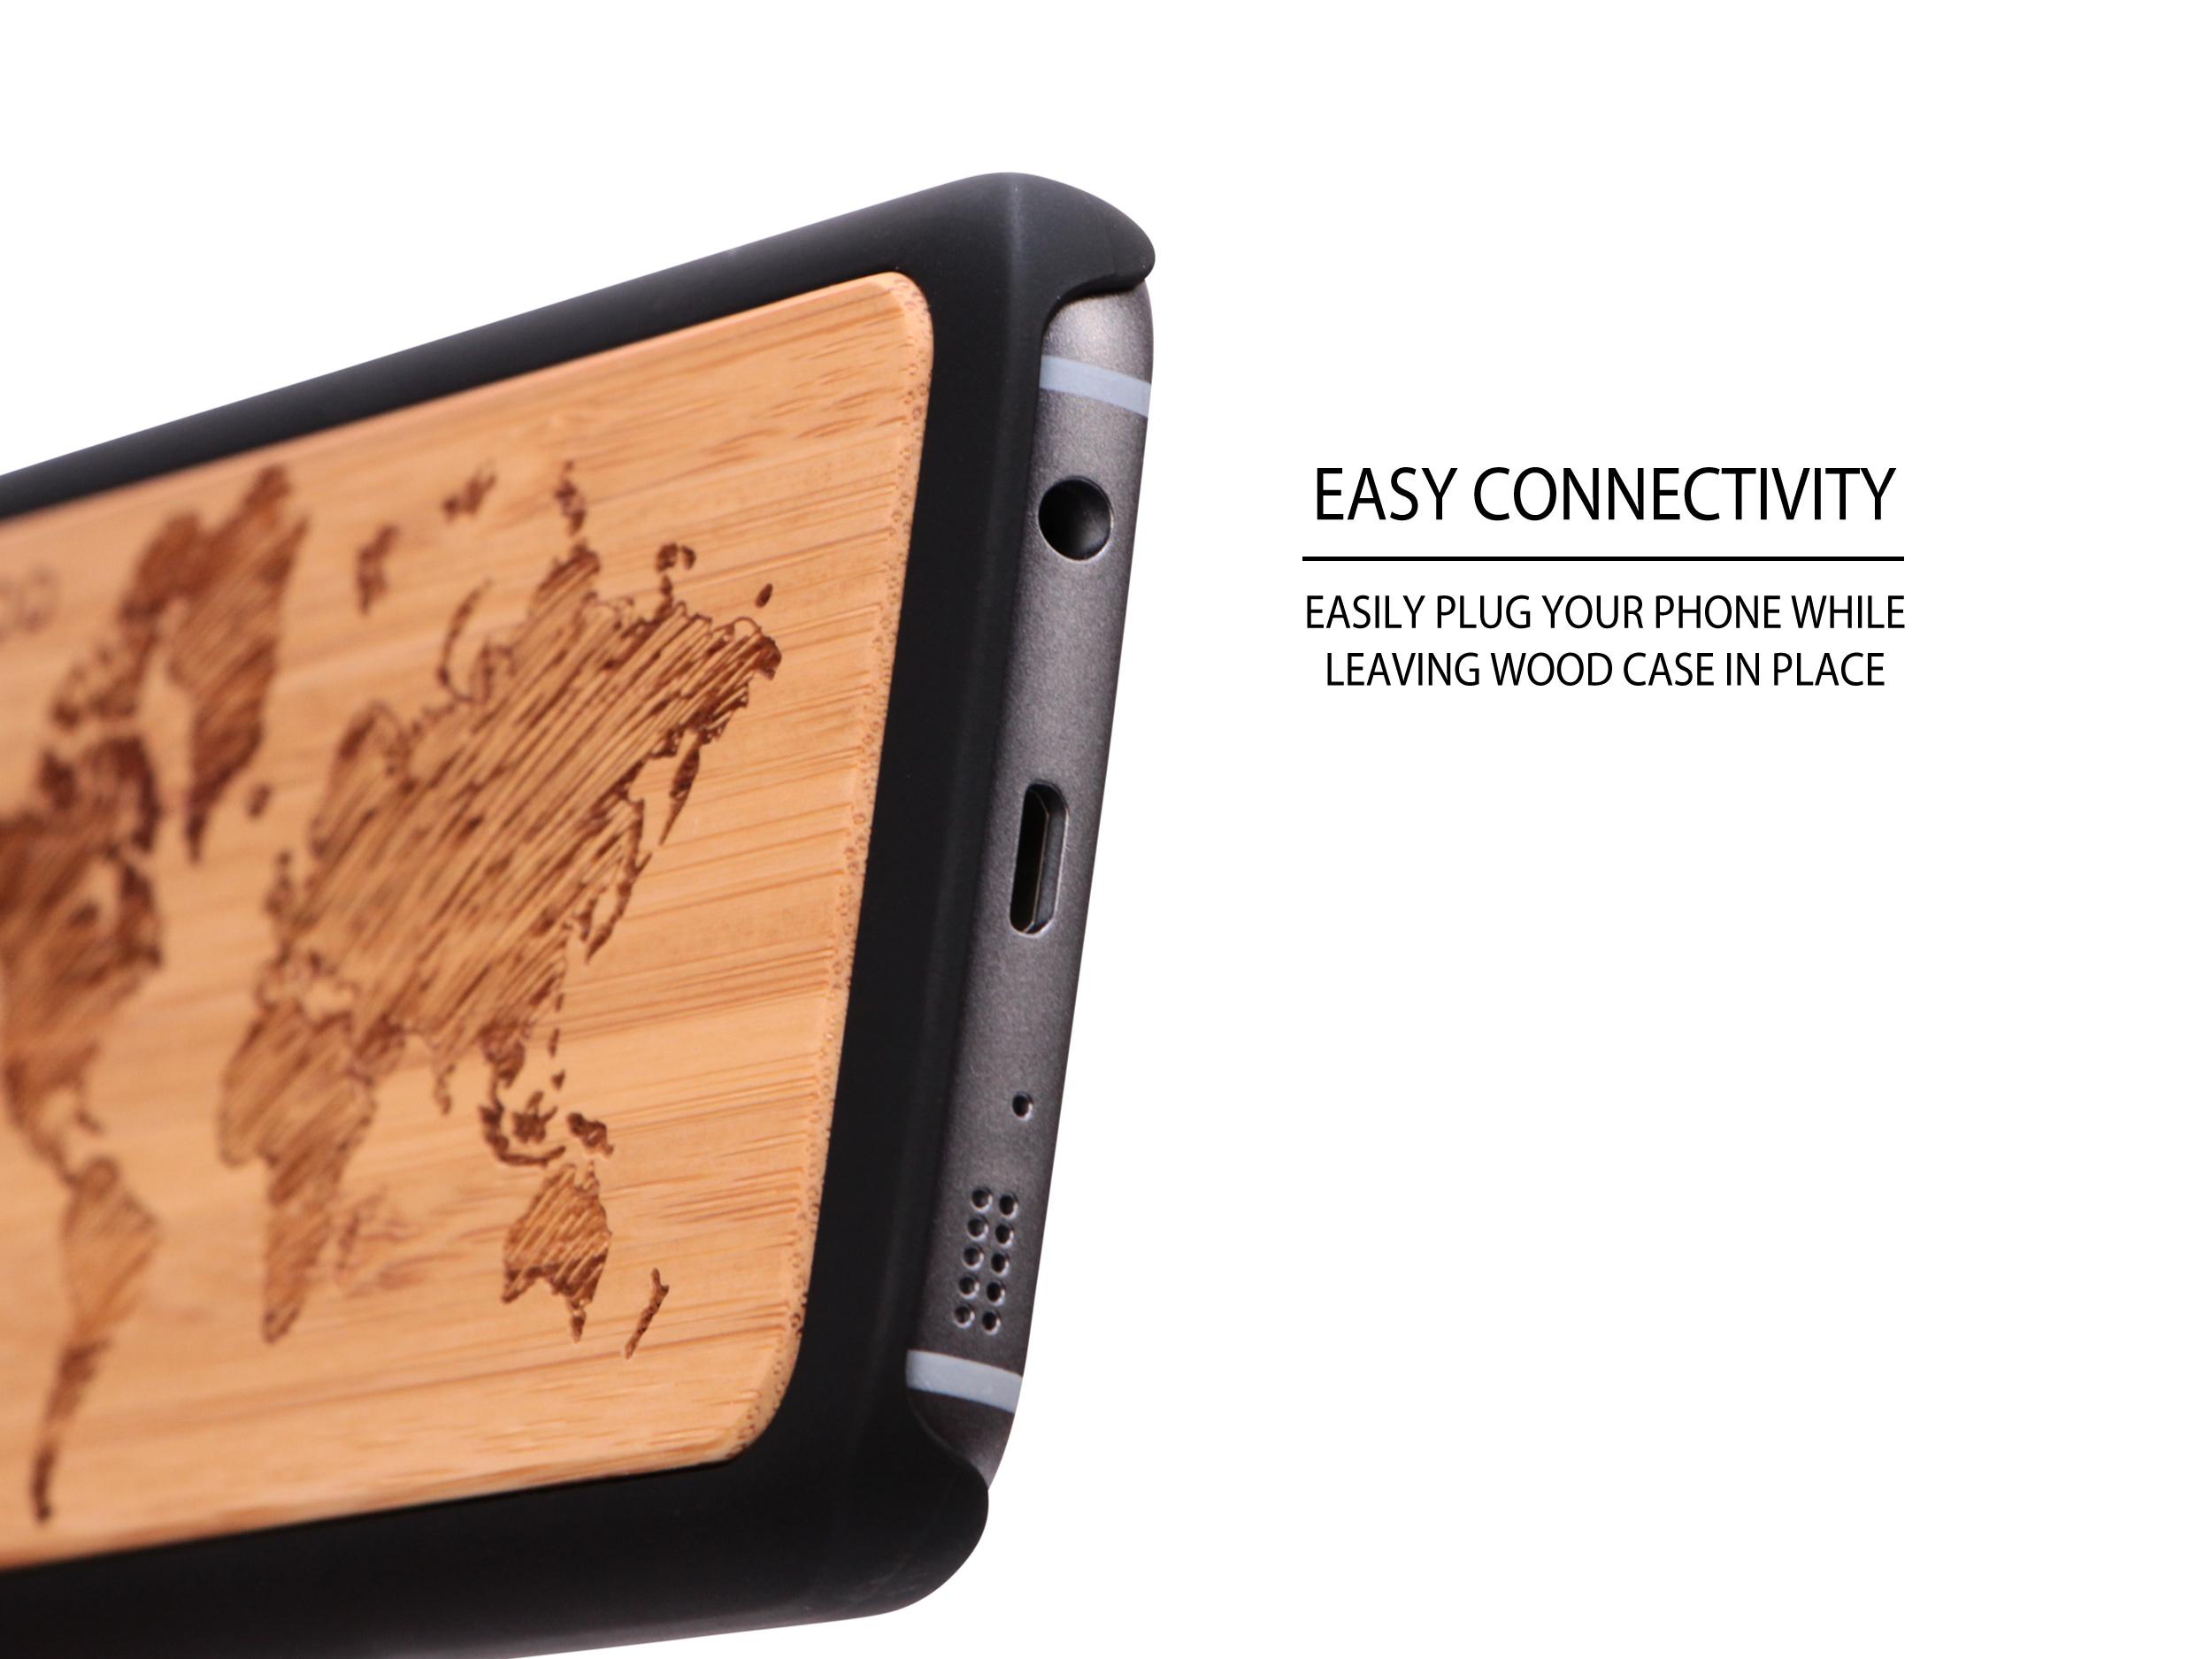 Samsung Galaxy S7 wood case world map socket